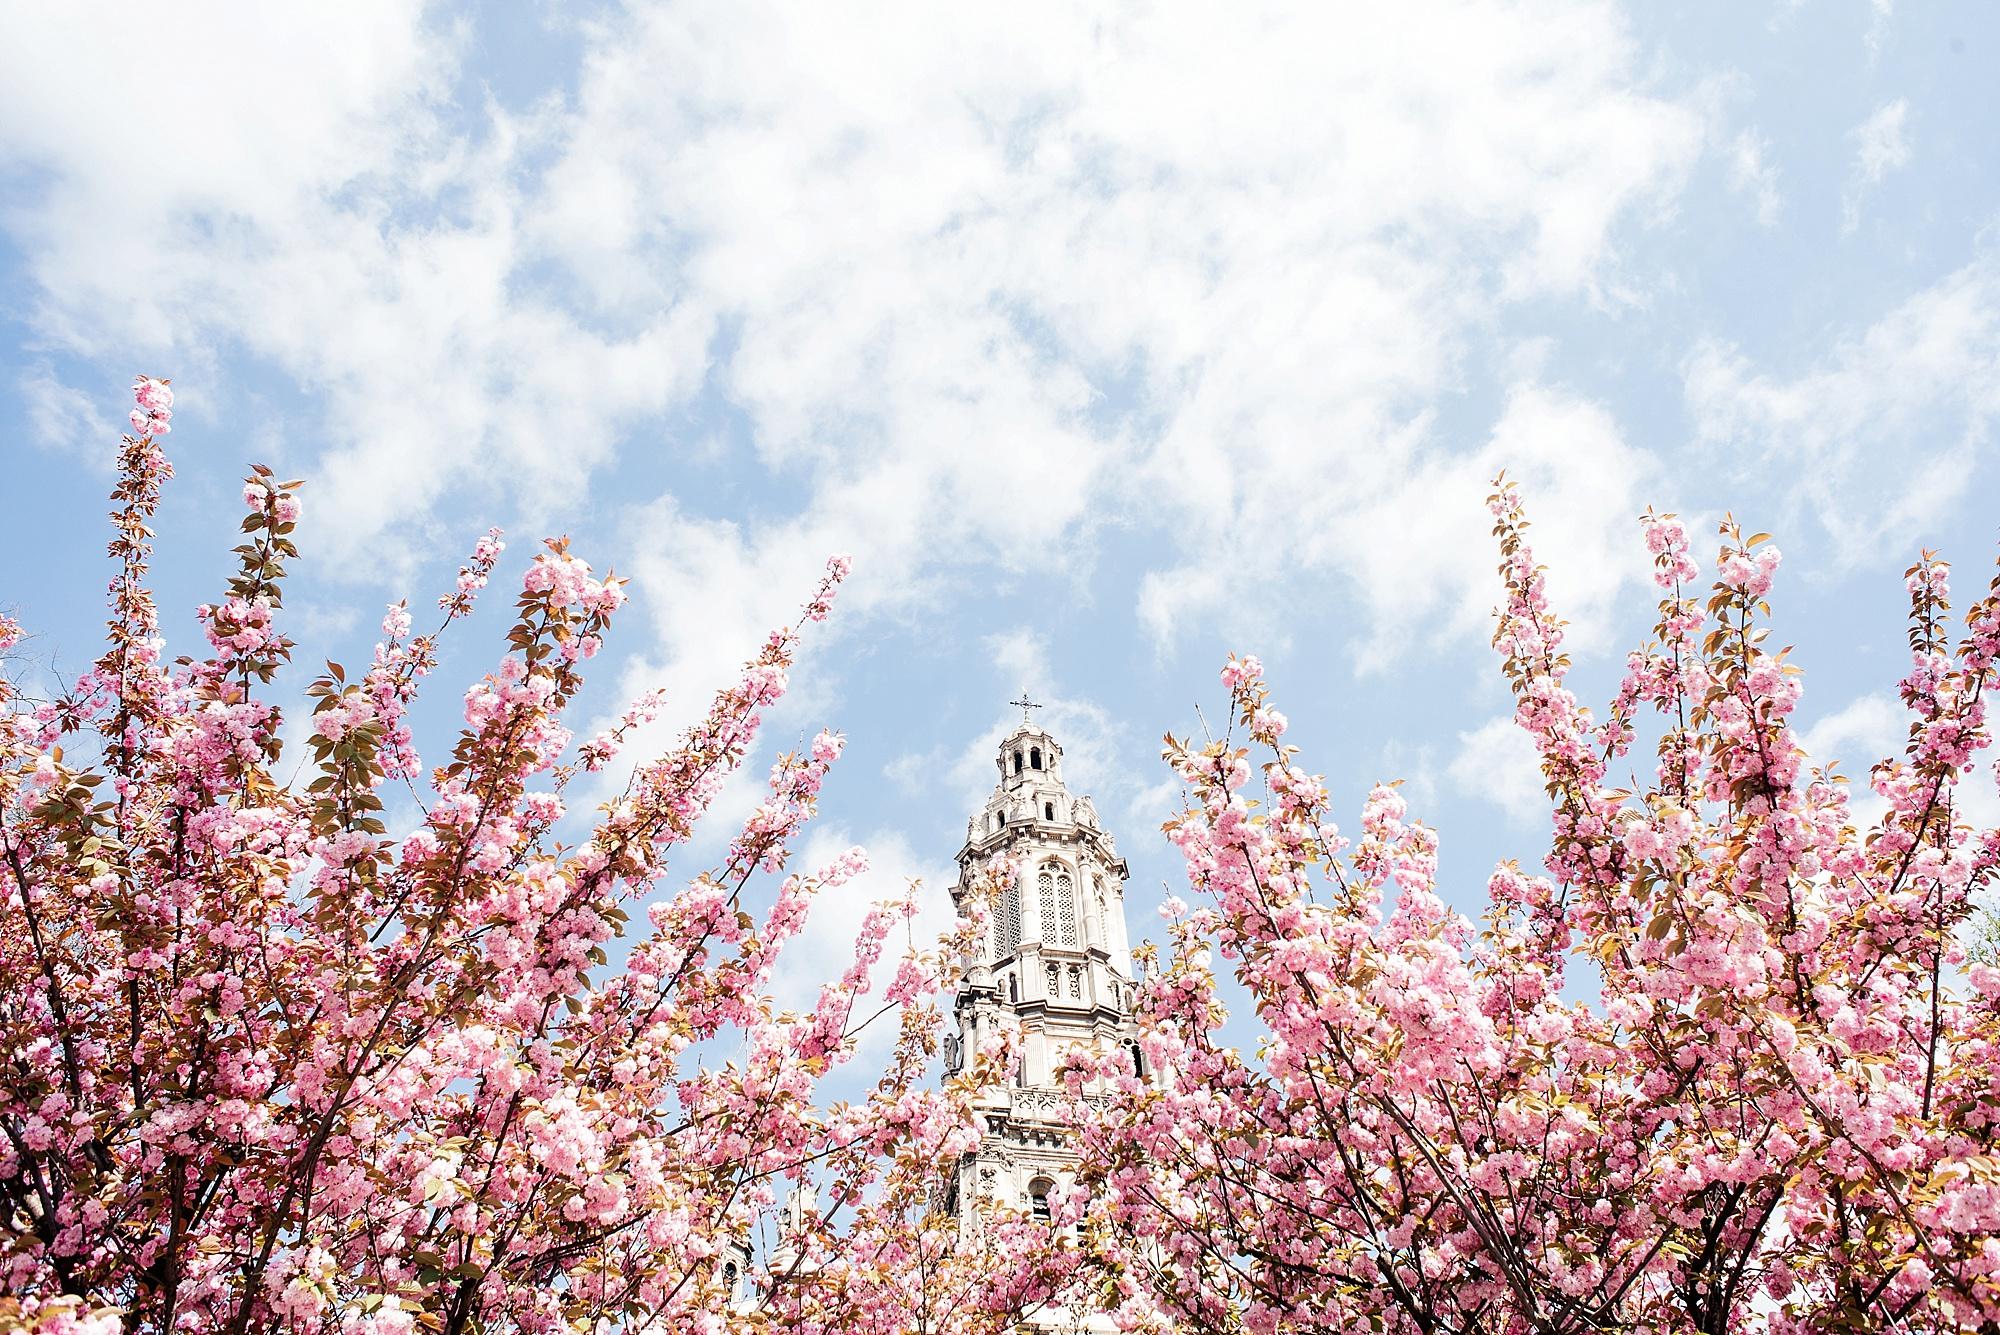 Darren-Bester-Photographer-Travel-Europe-Paris_0049.jpg